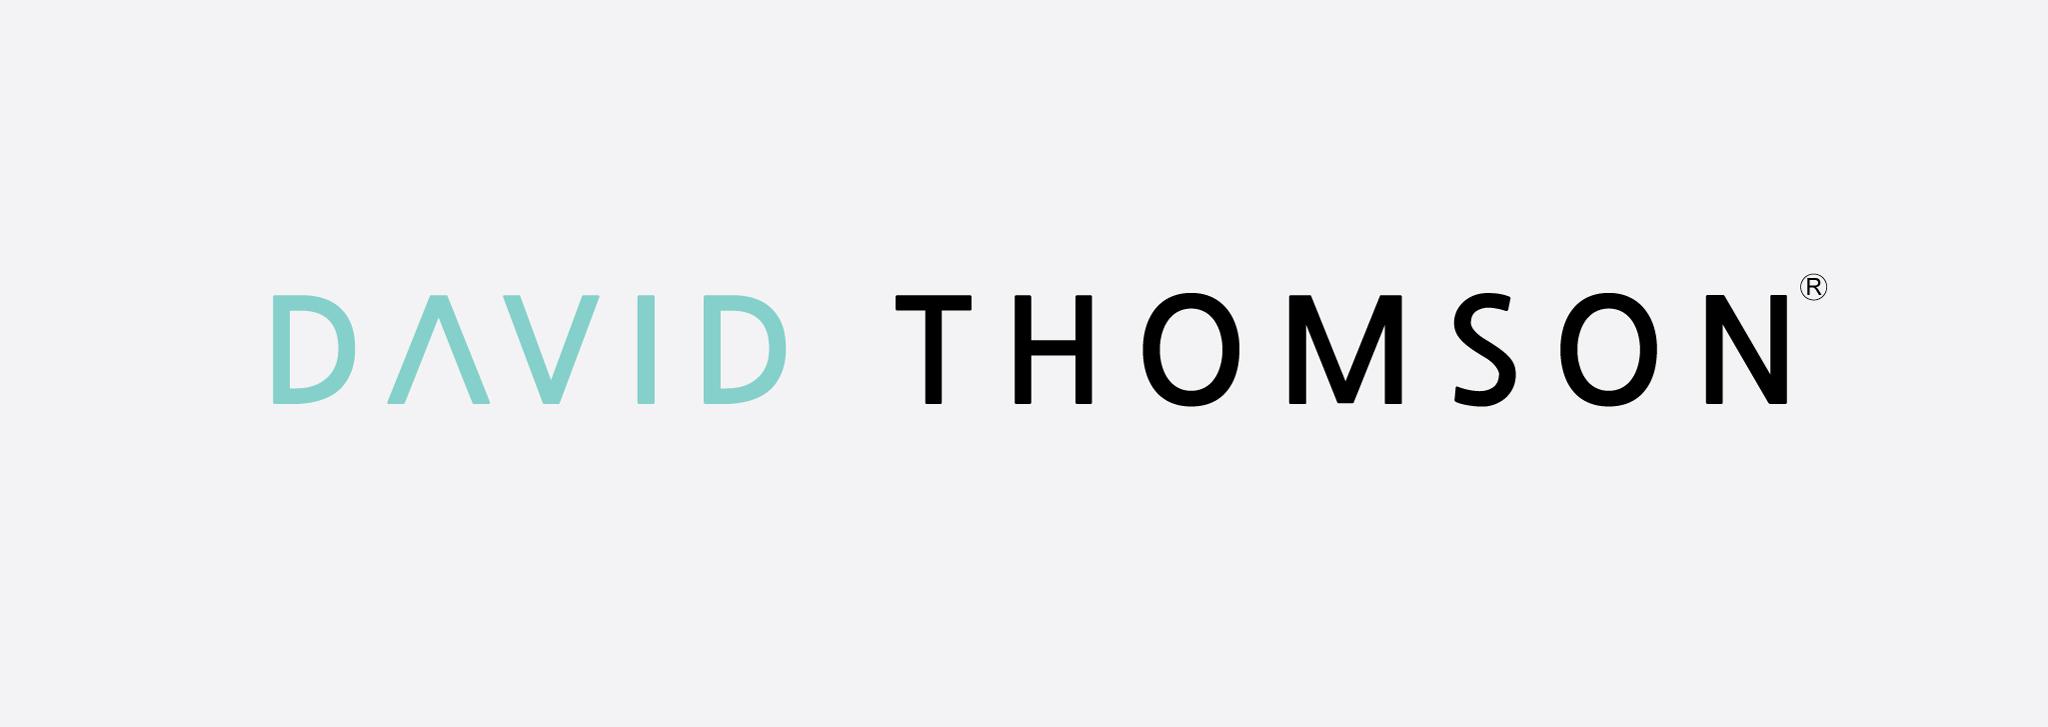 Company Logo – David Thomson – Brian Of All Trades